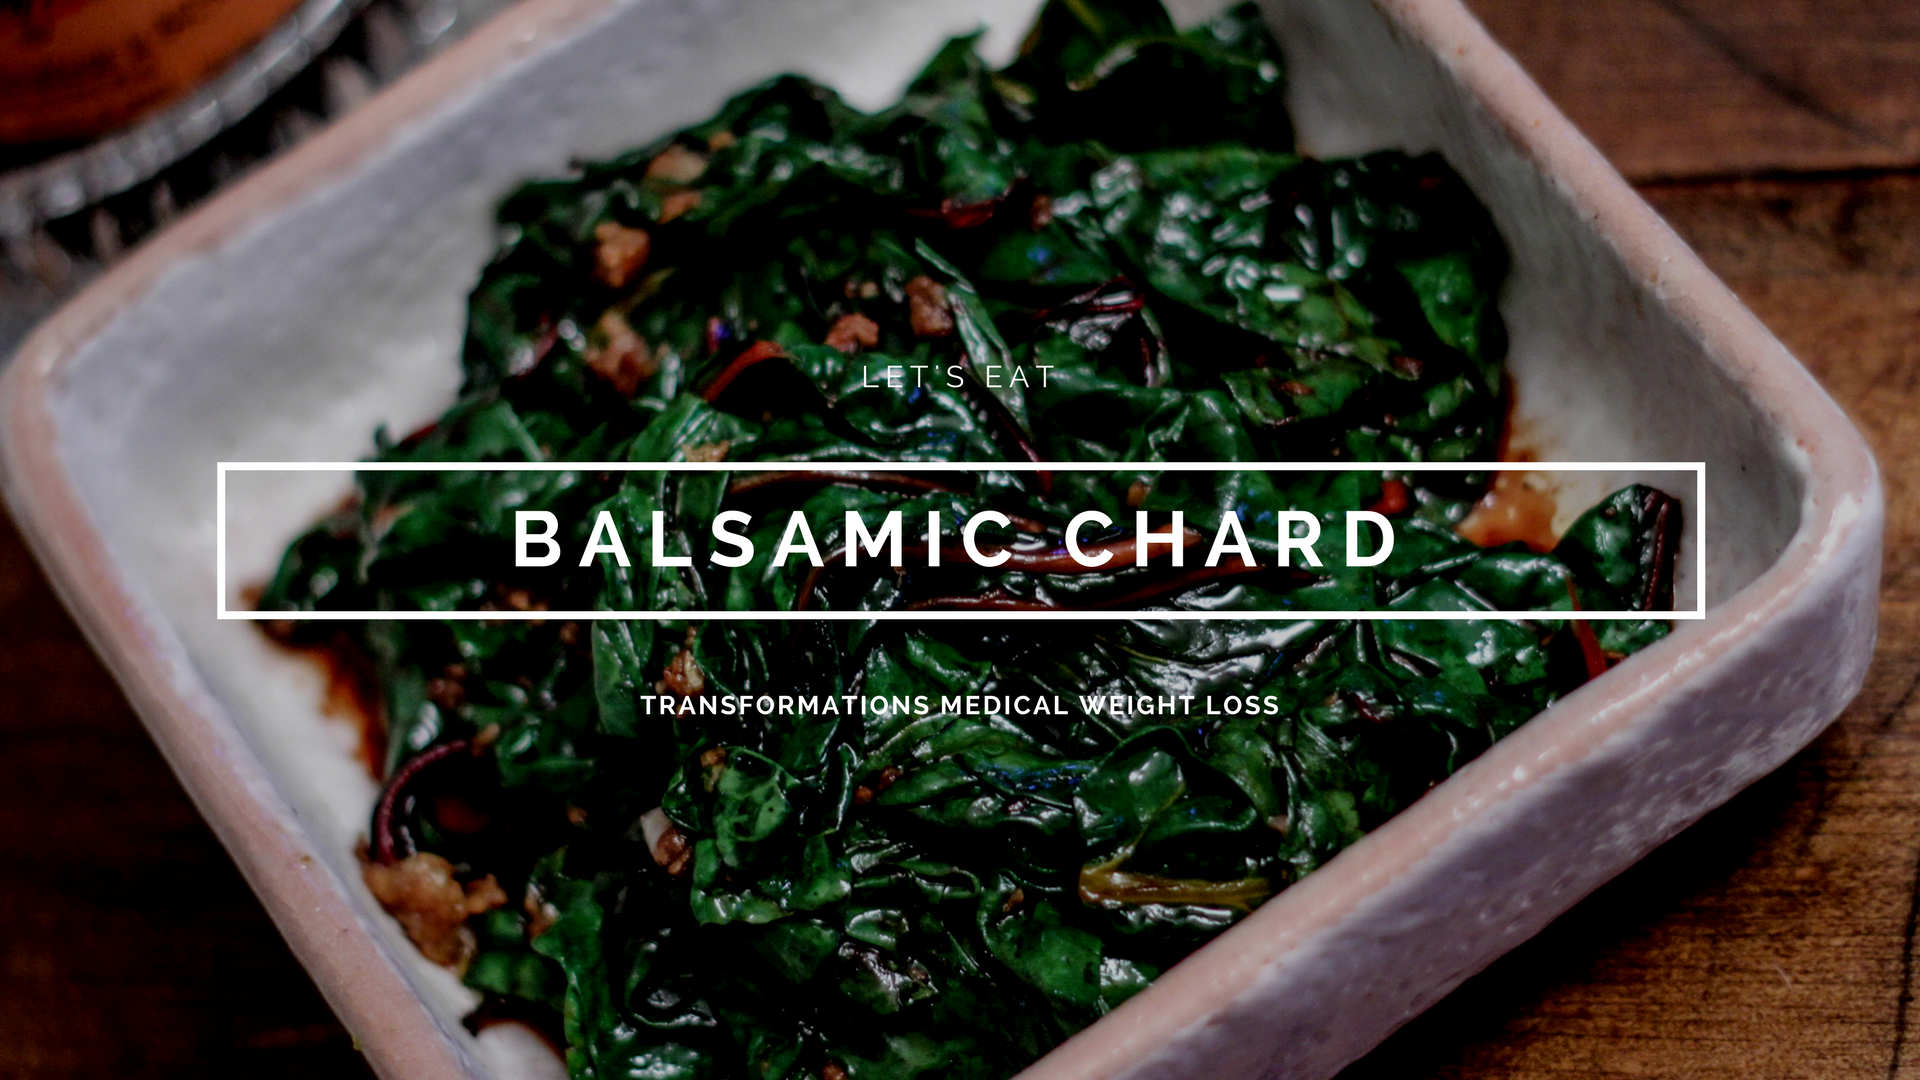 Balsamic Chard